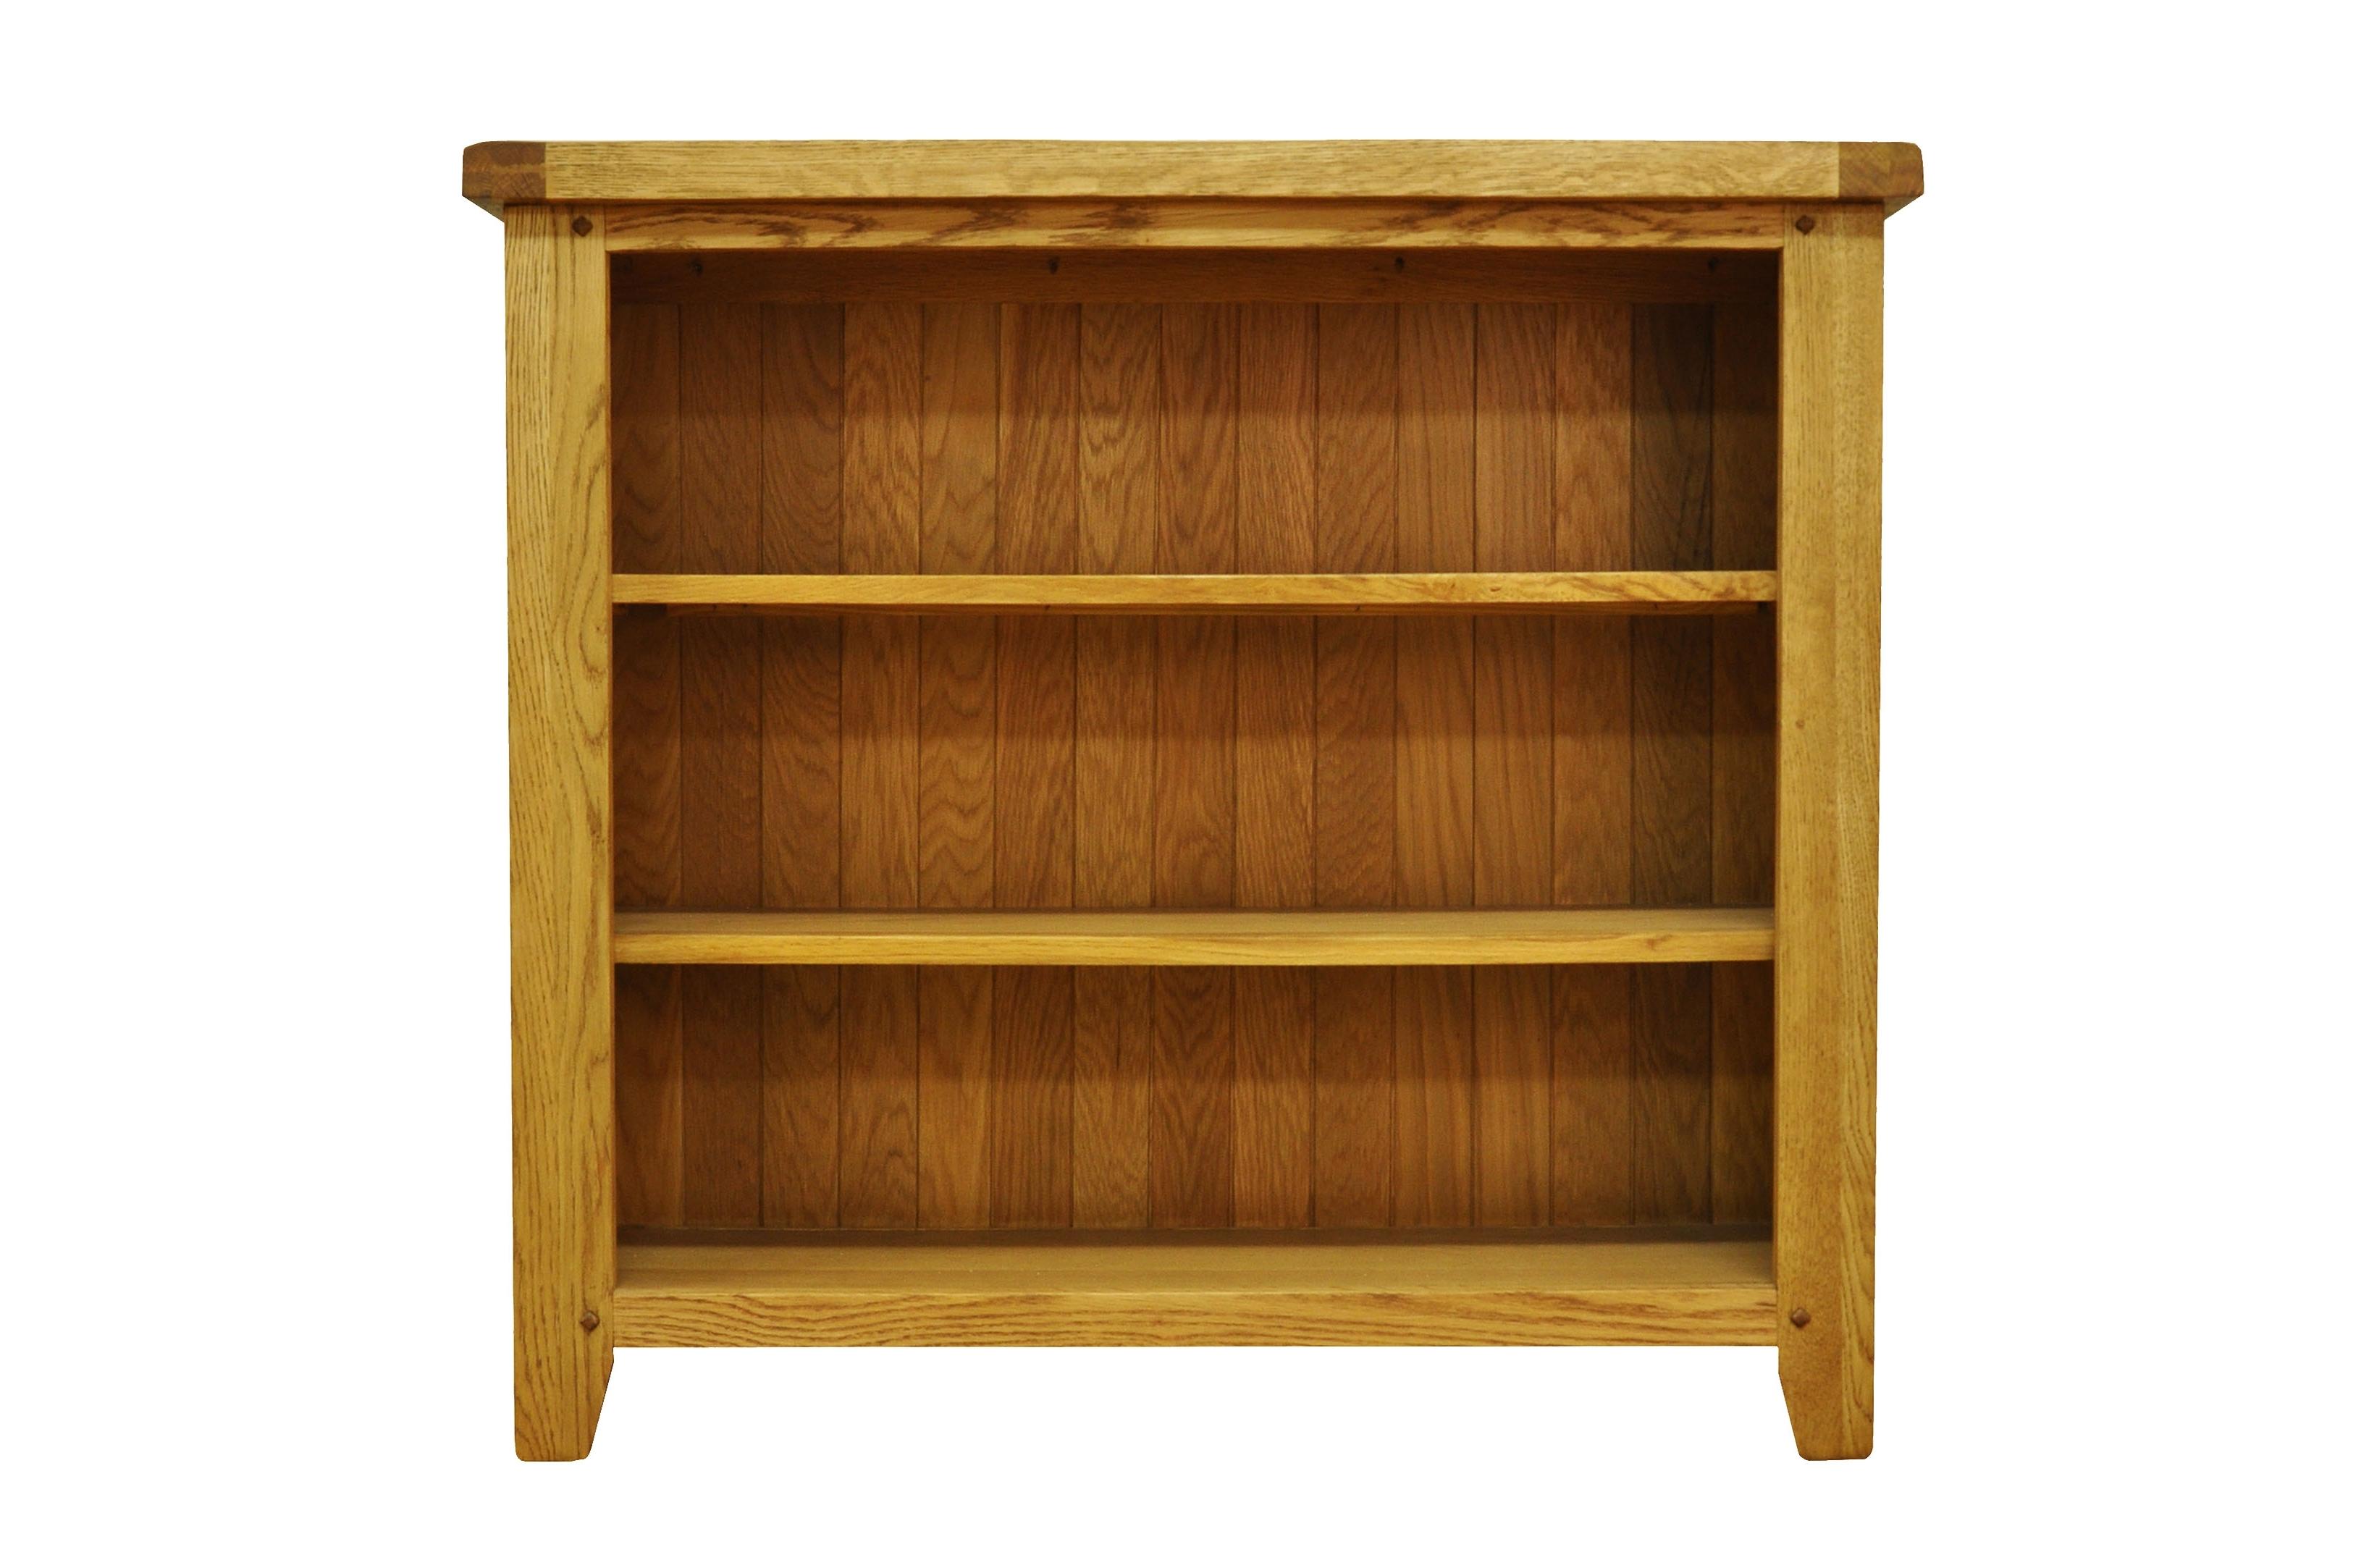 Small Bookcases For 2018 Bookcases : Stanton Small Wide Rustic Oak Bookcasestanton Small (View 7 of 15)